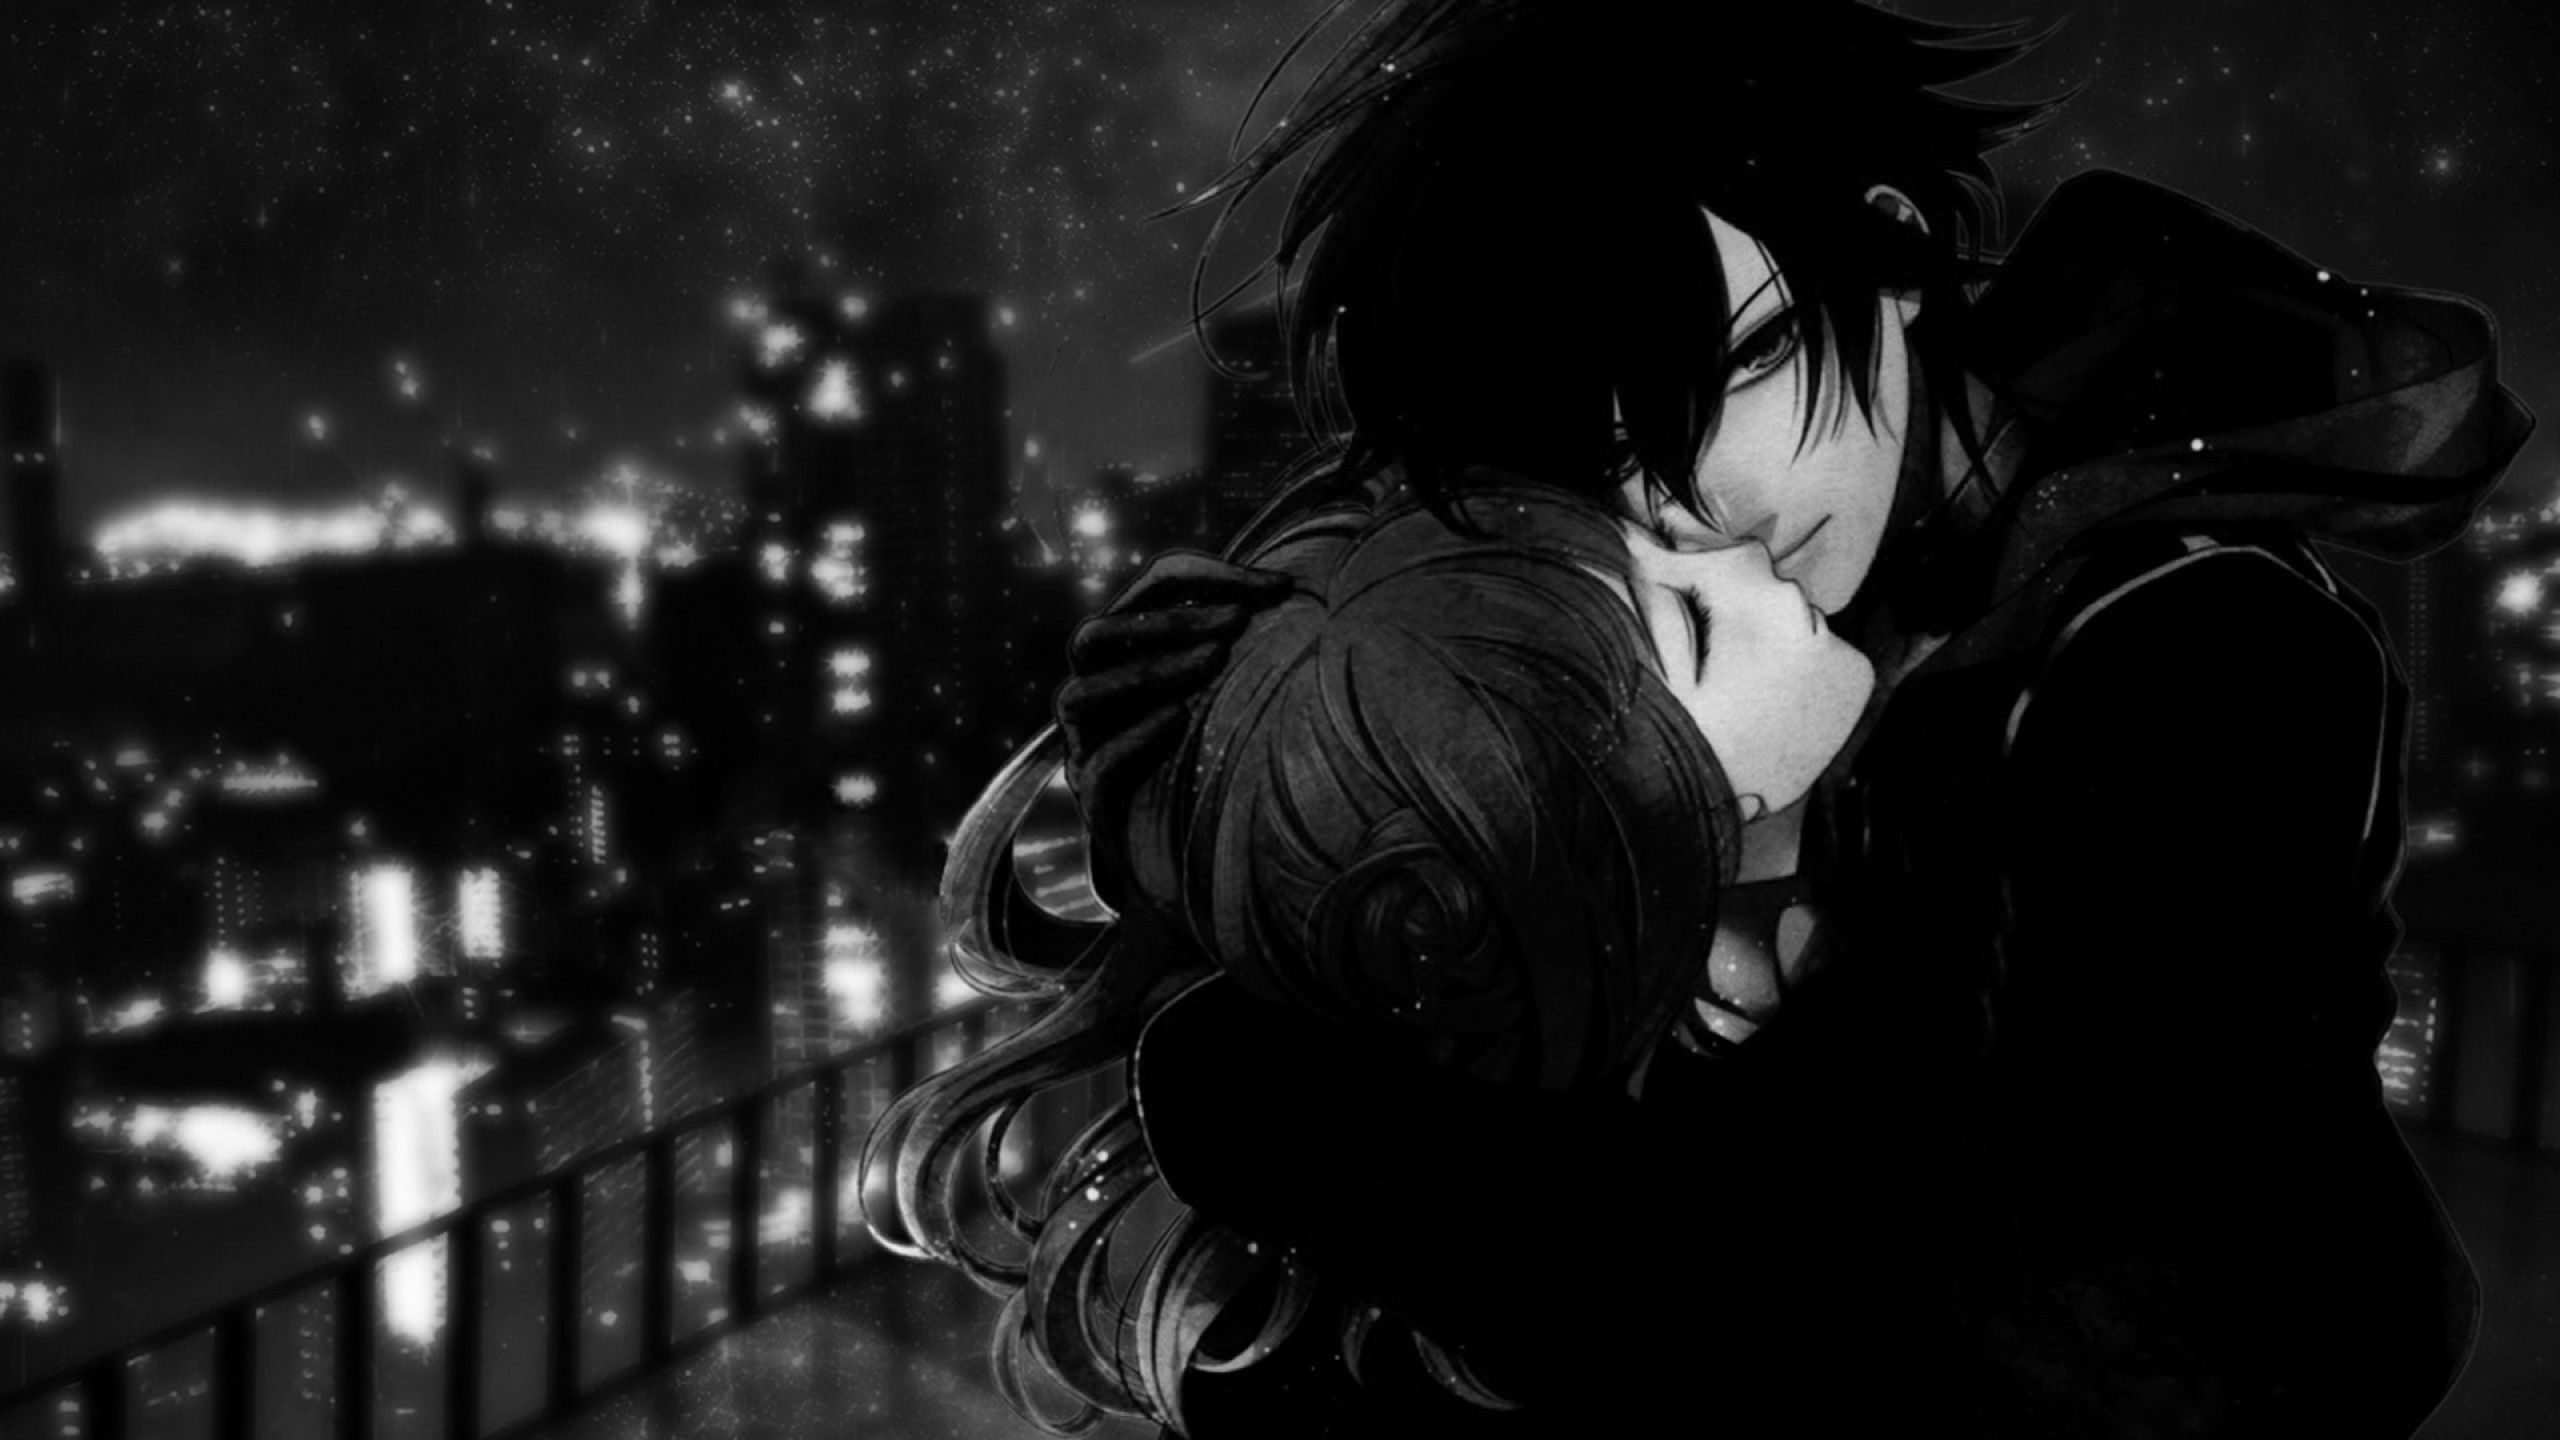 Love Dark Anime Wallpapers Top Free Love Dark Anime Backgrounds Wallpaperaccess